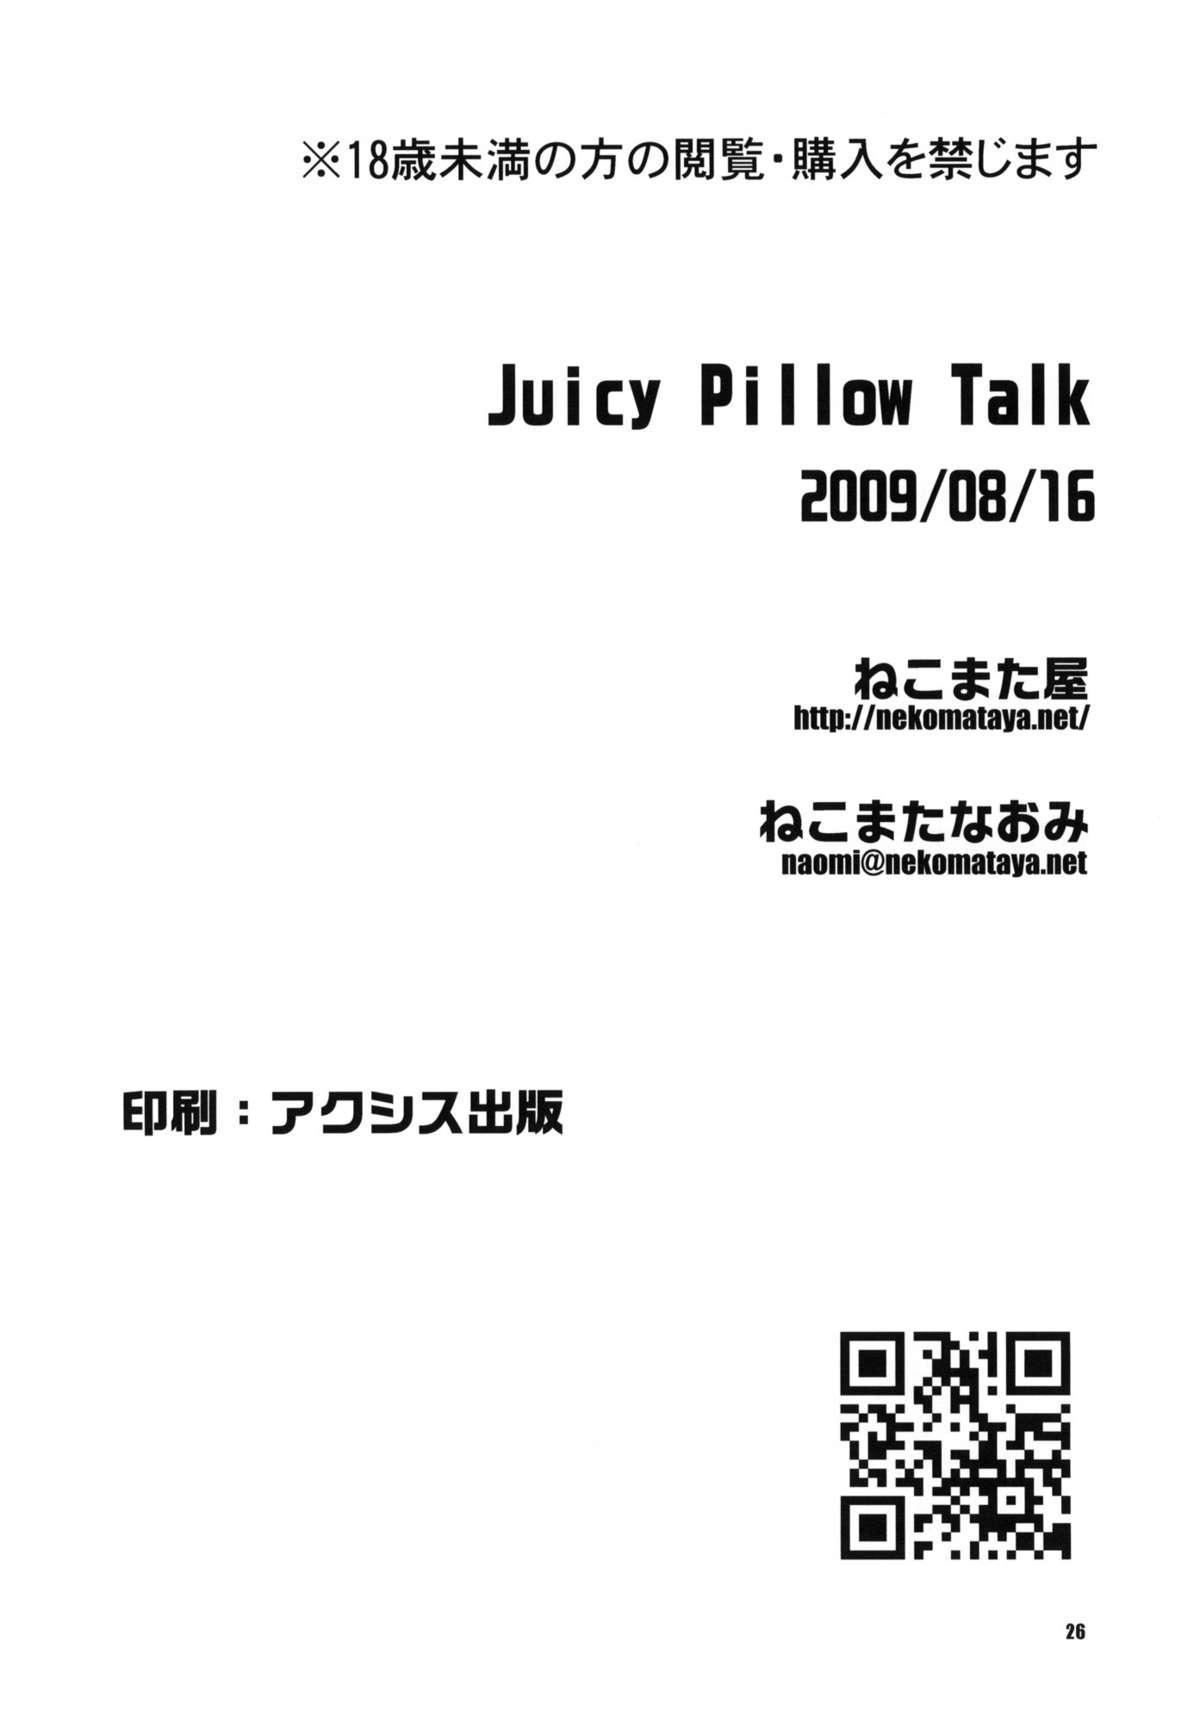 Juicy Pillow Talk 24